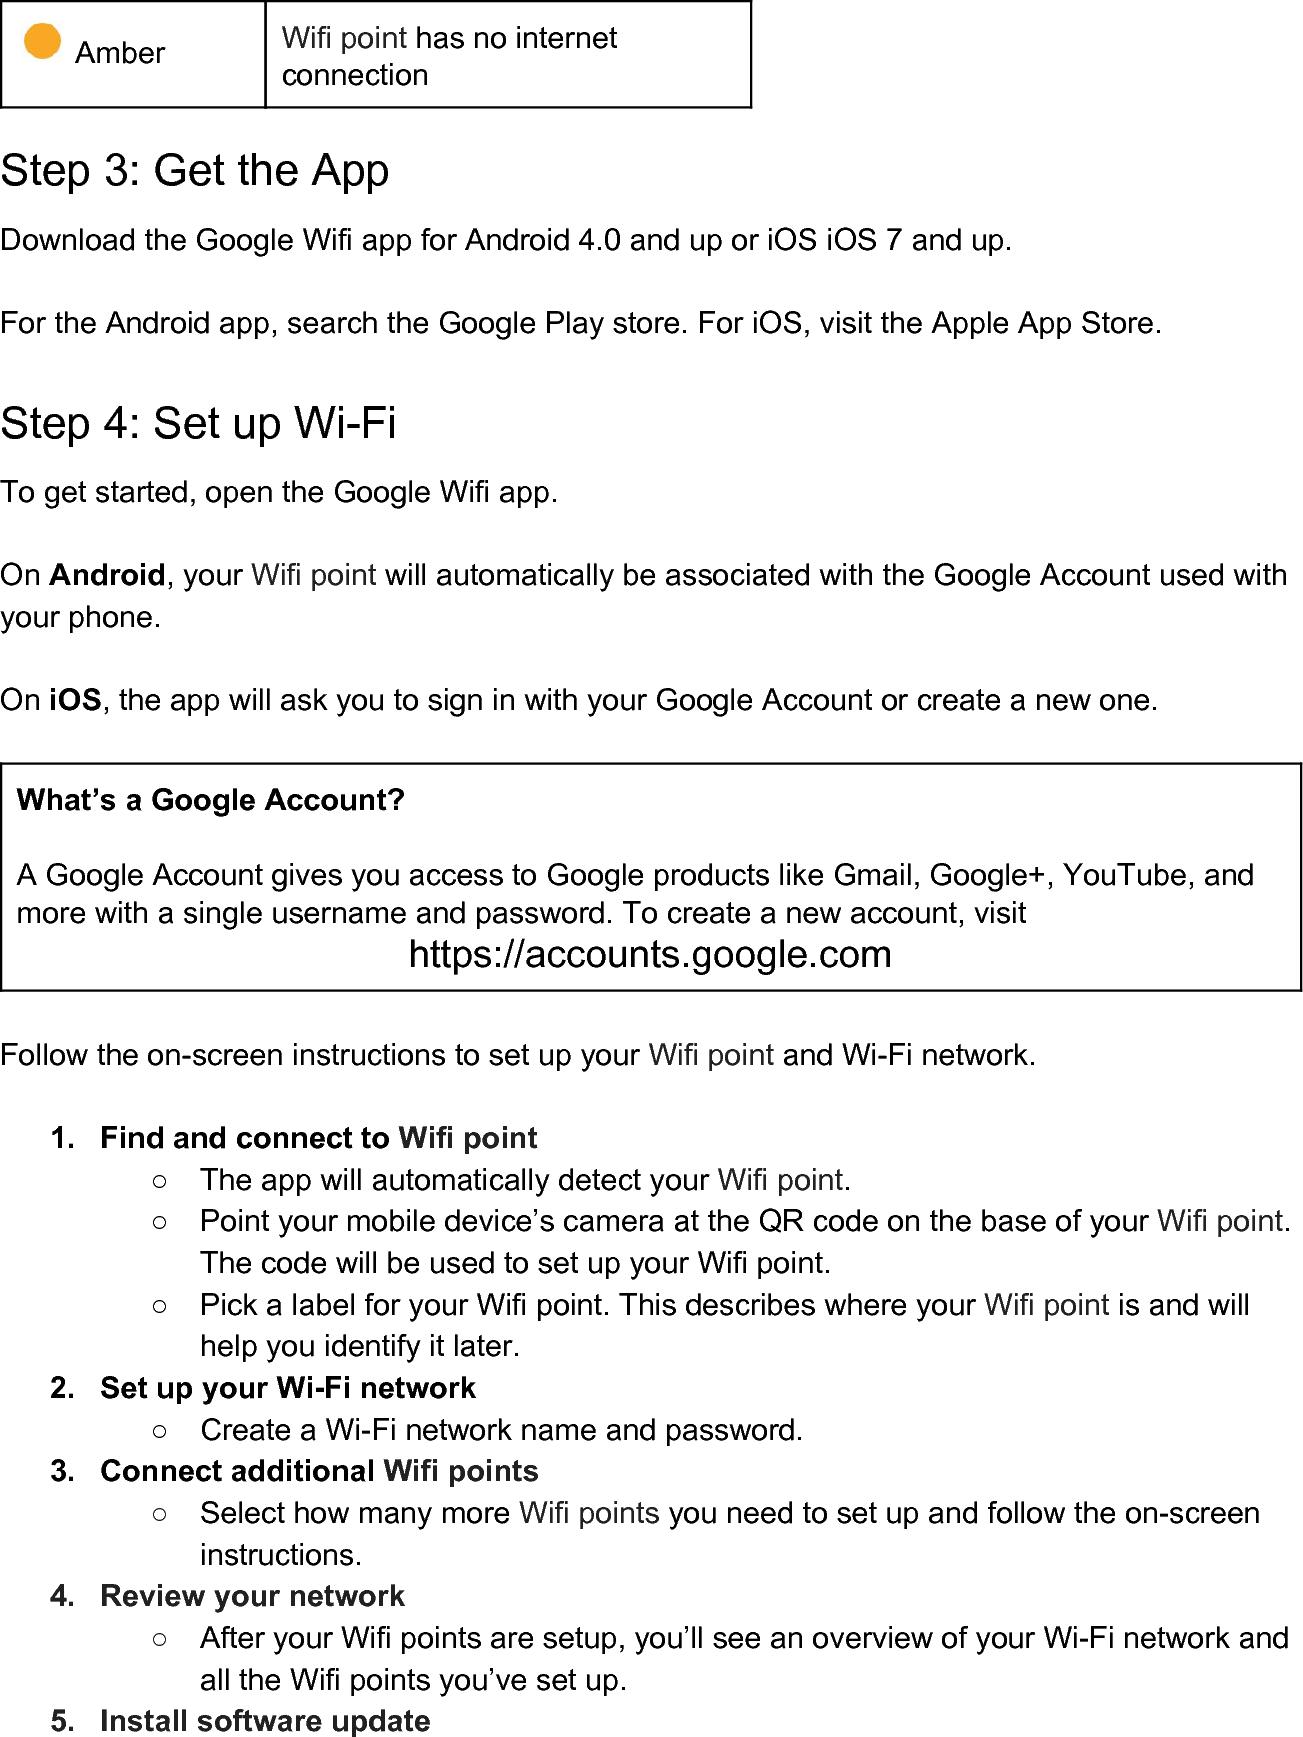 google wifi setup instructions